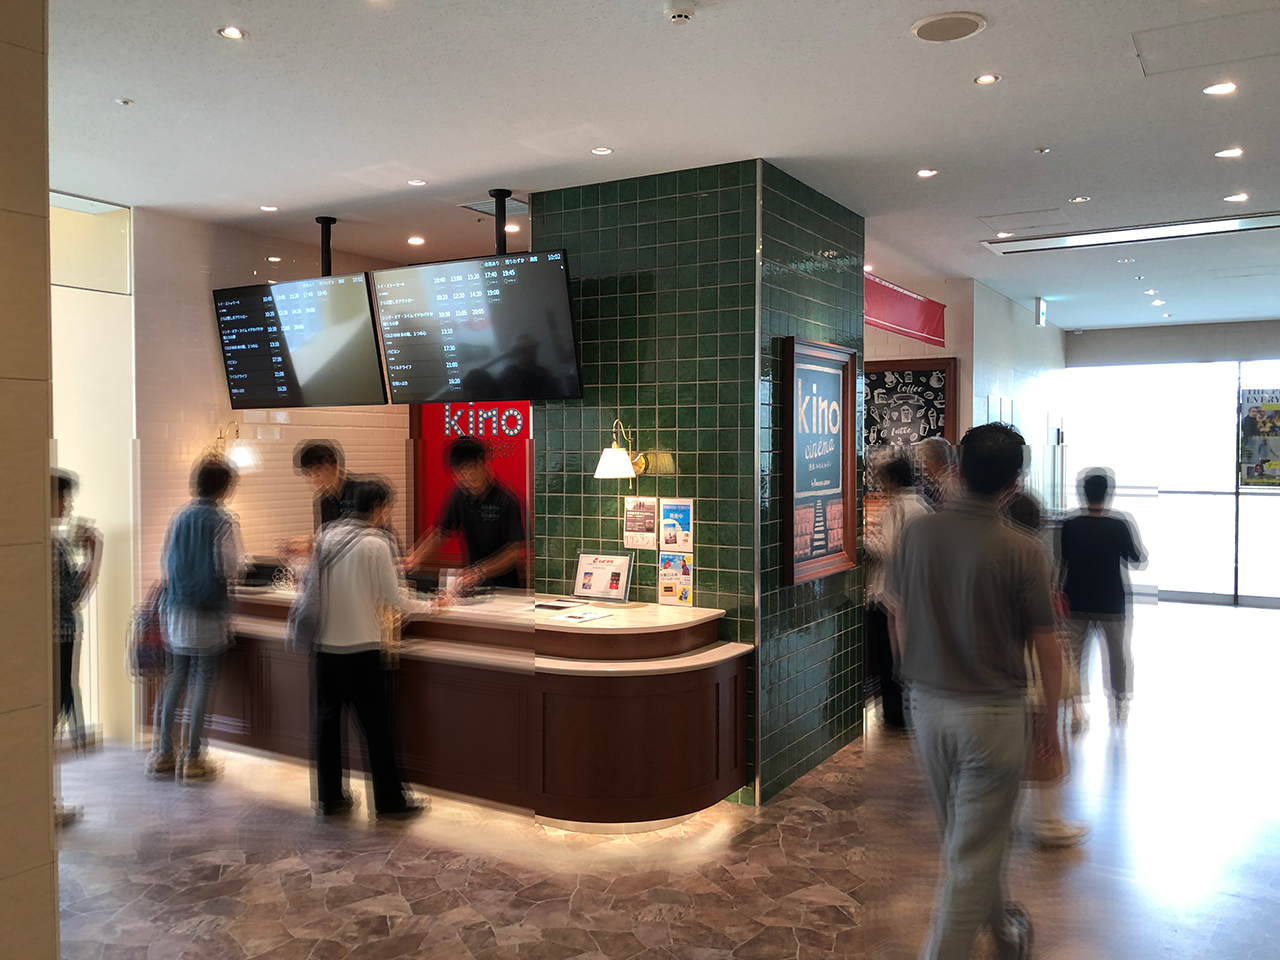 〈KINO cinema みなとみらい〉2階のチケットカウンター